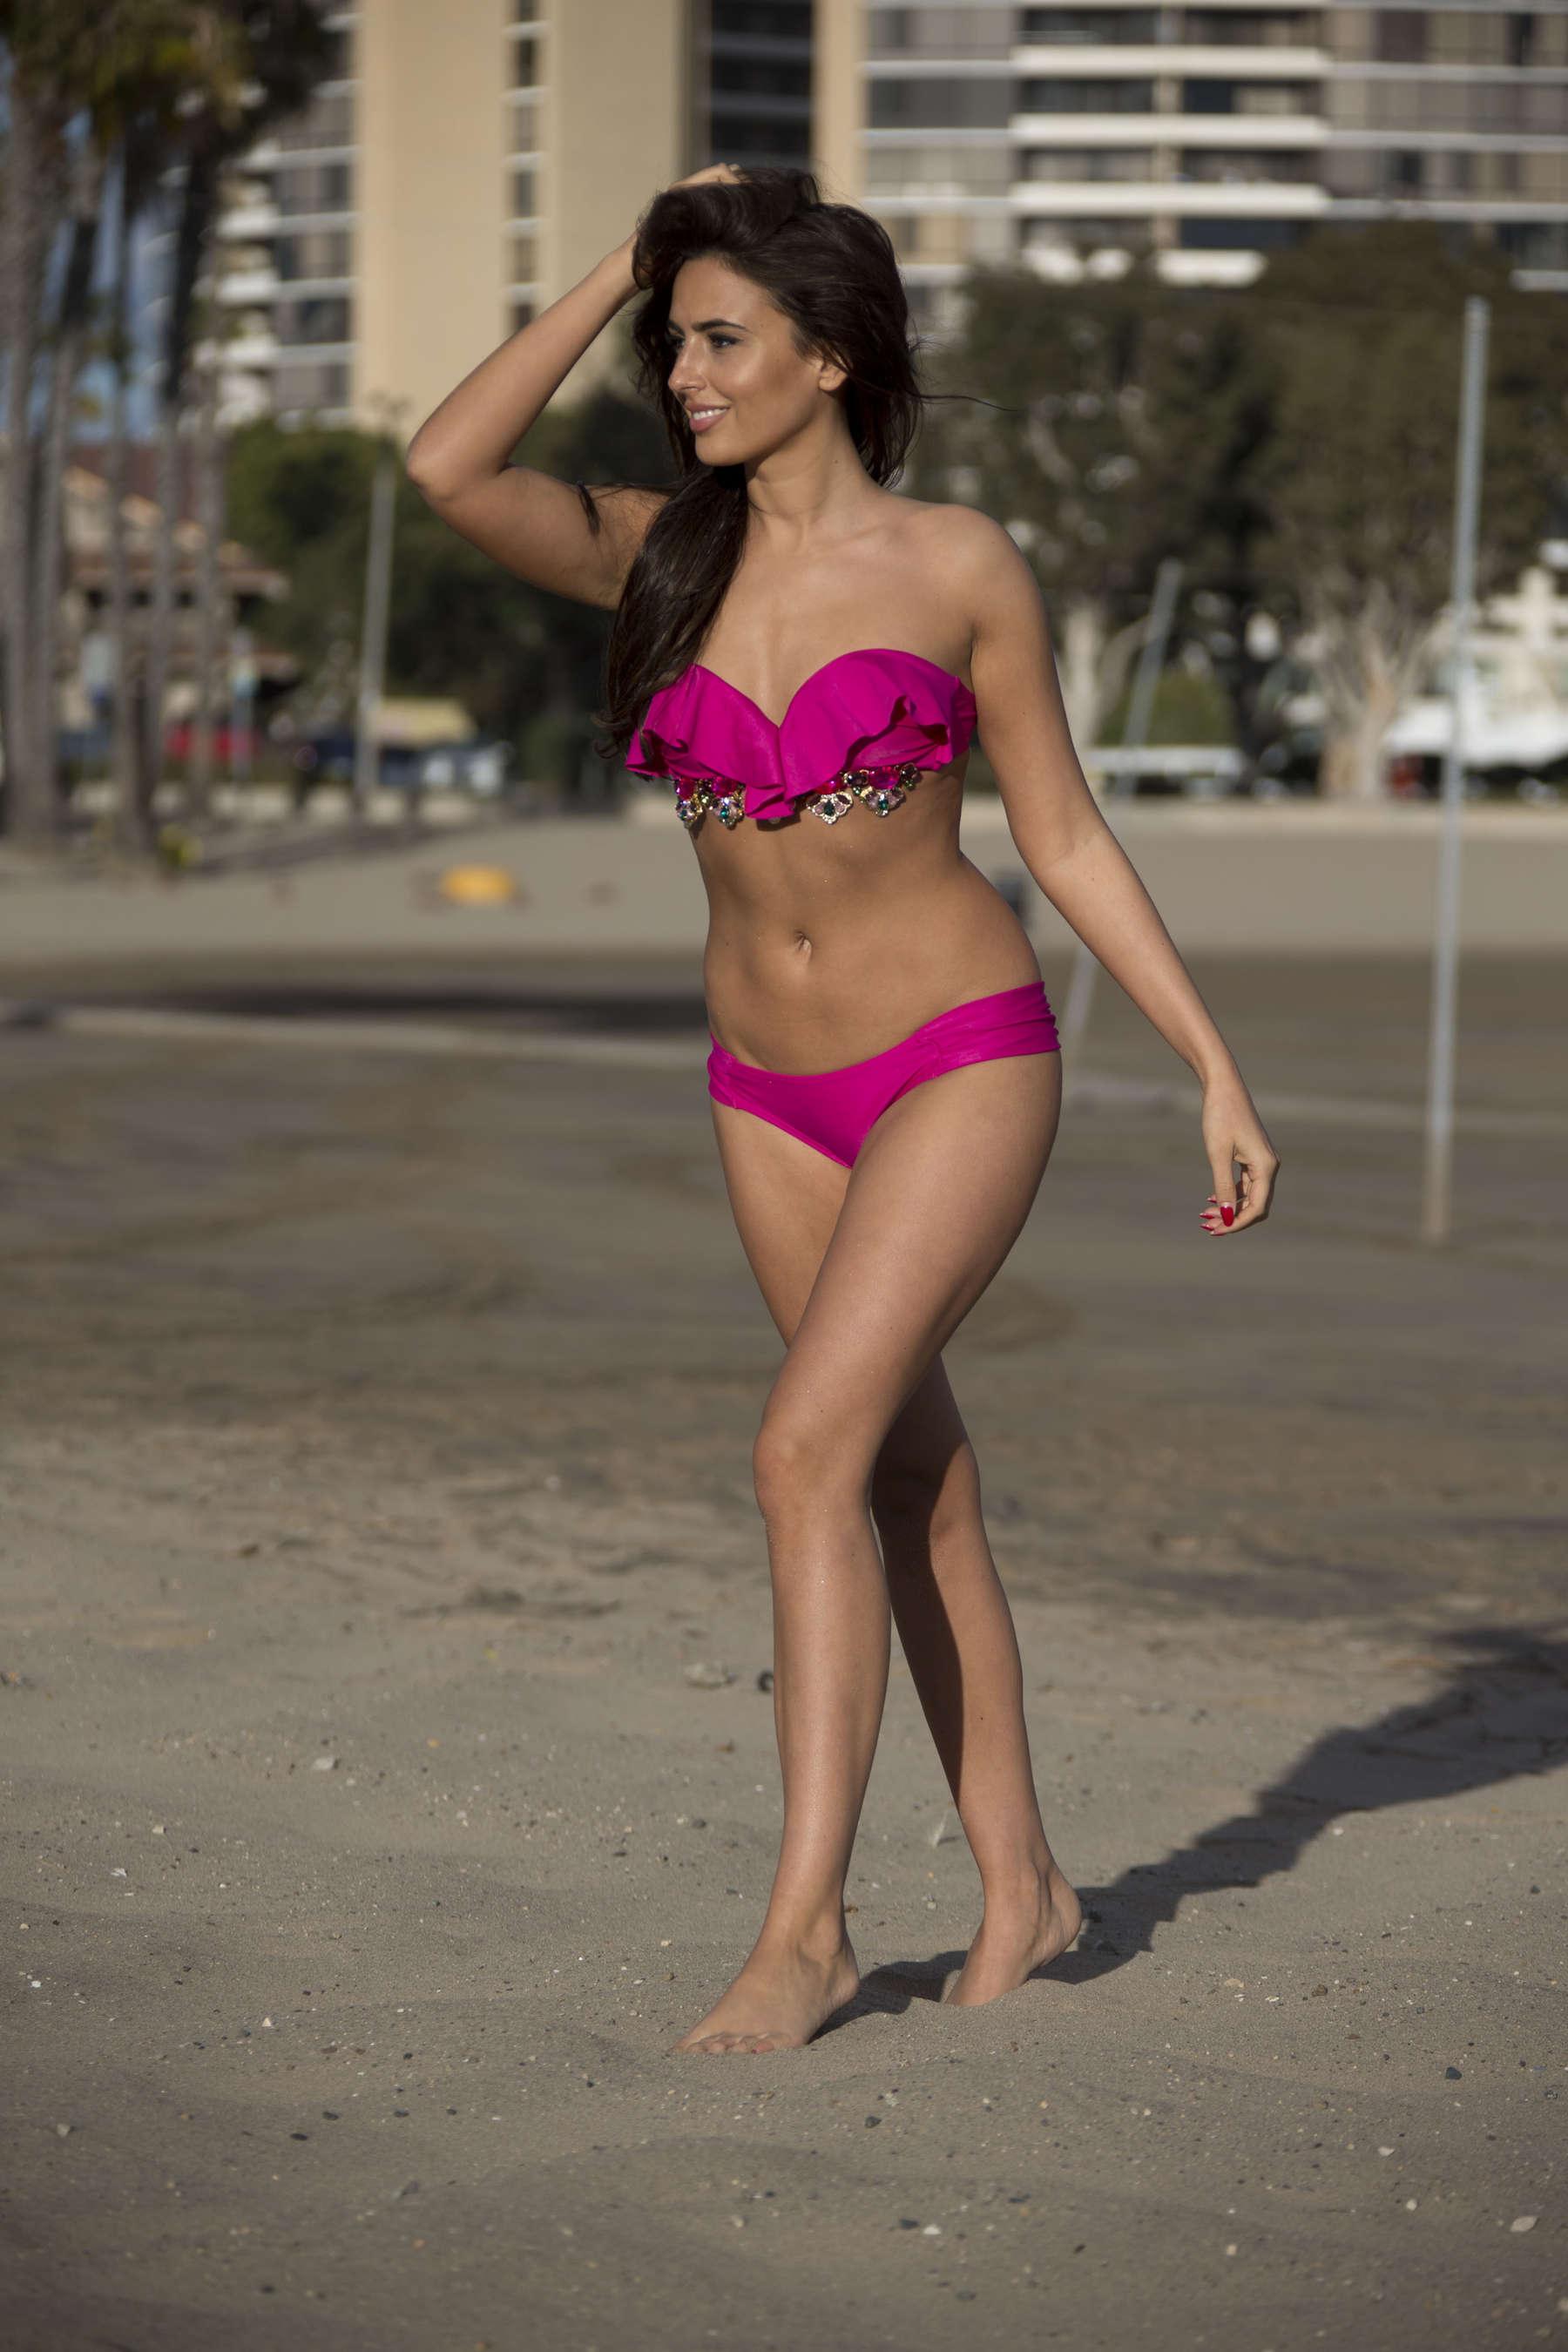 Nadia Forde 2016 : Nadia Forde in Pink Bikini -09